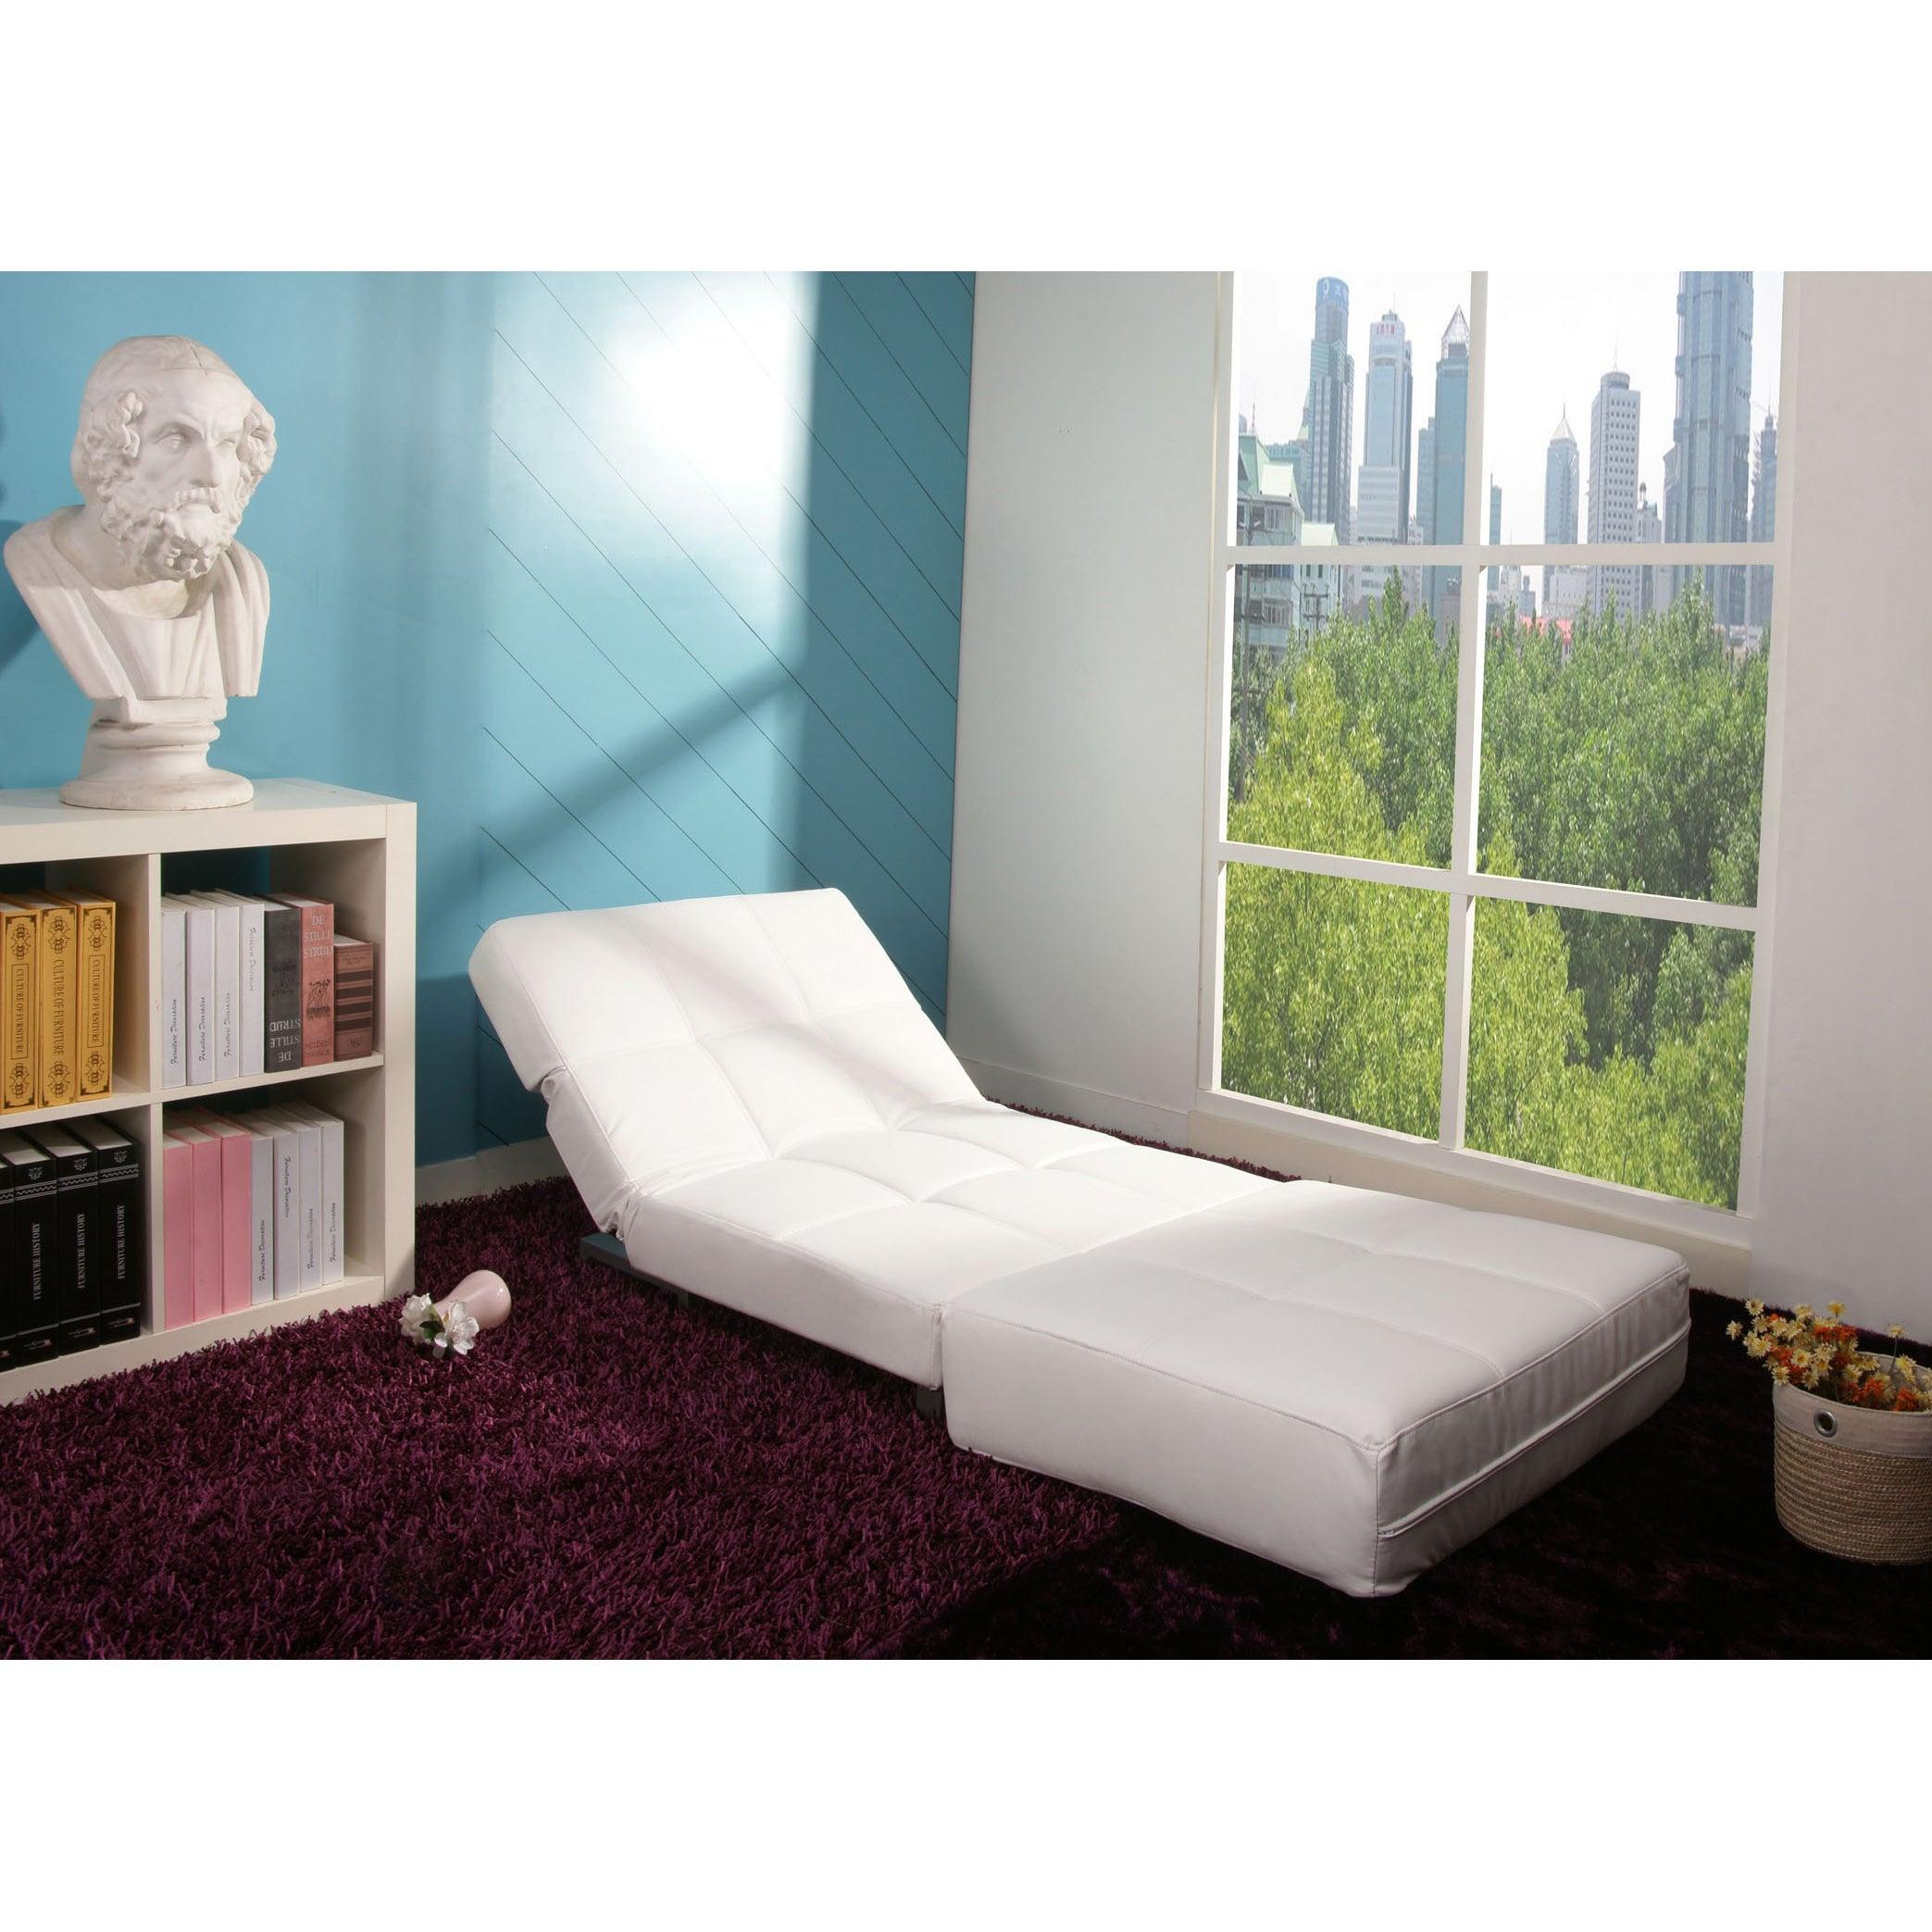 store the bed chocolate austin full thyme product futon dark platform futons